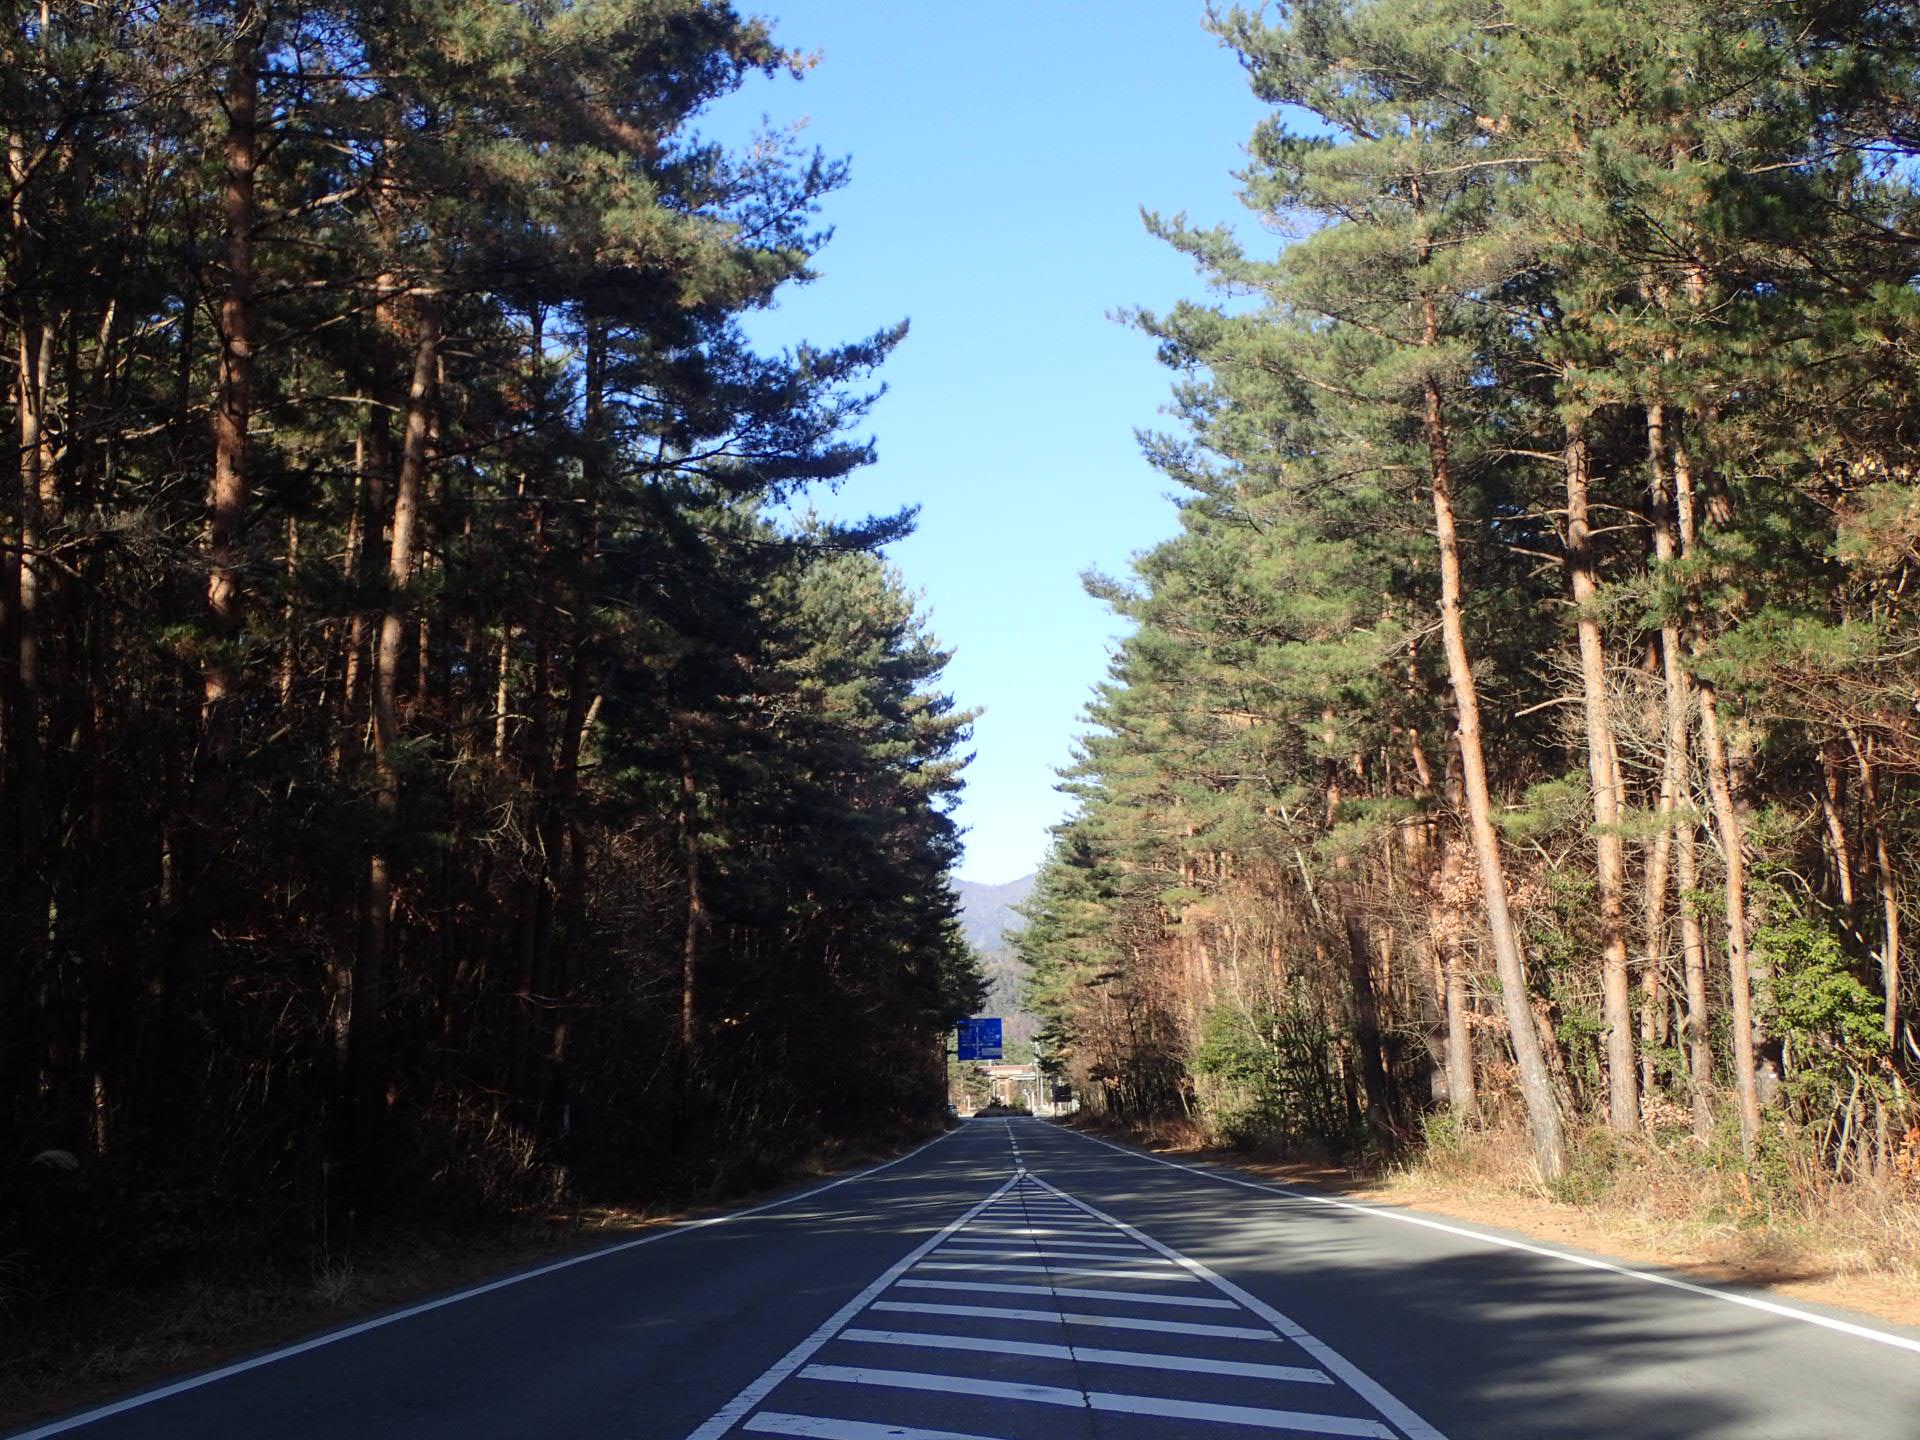 http://www.yamanashi-kankou.jp/blog/1%E5%89%A3%E4%B8%B8%E5%B0%BE.jpg